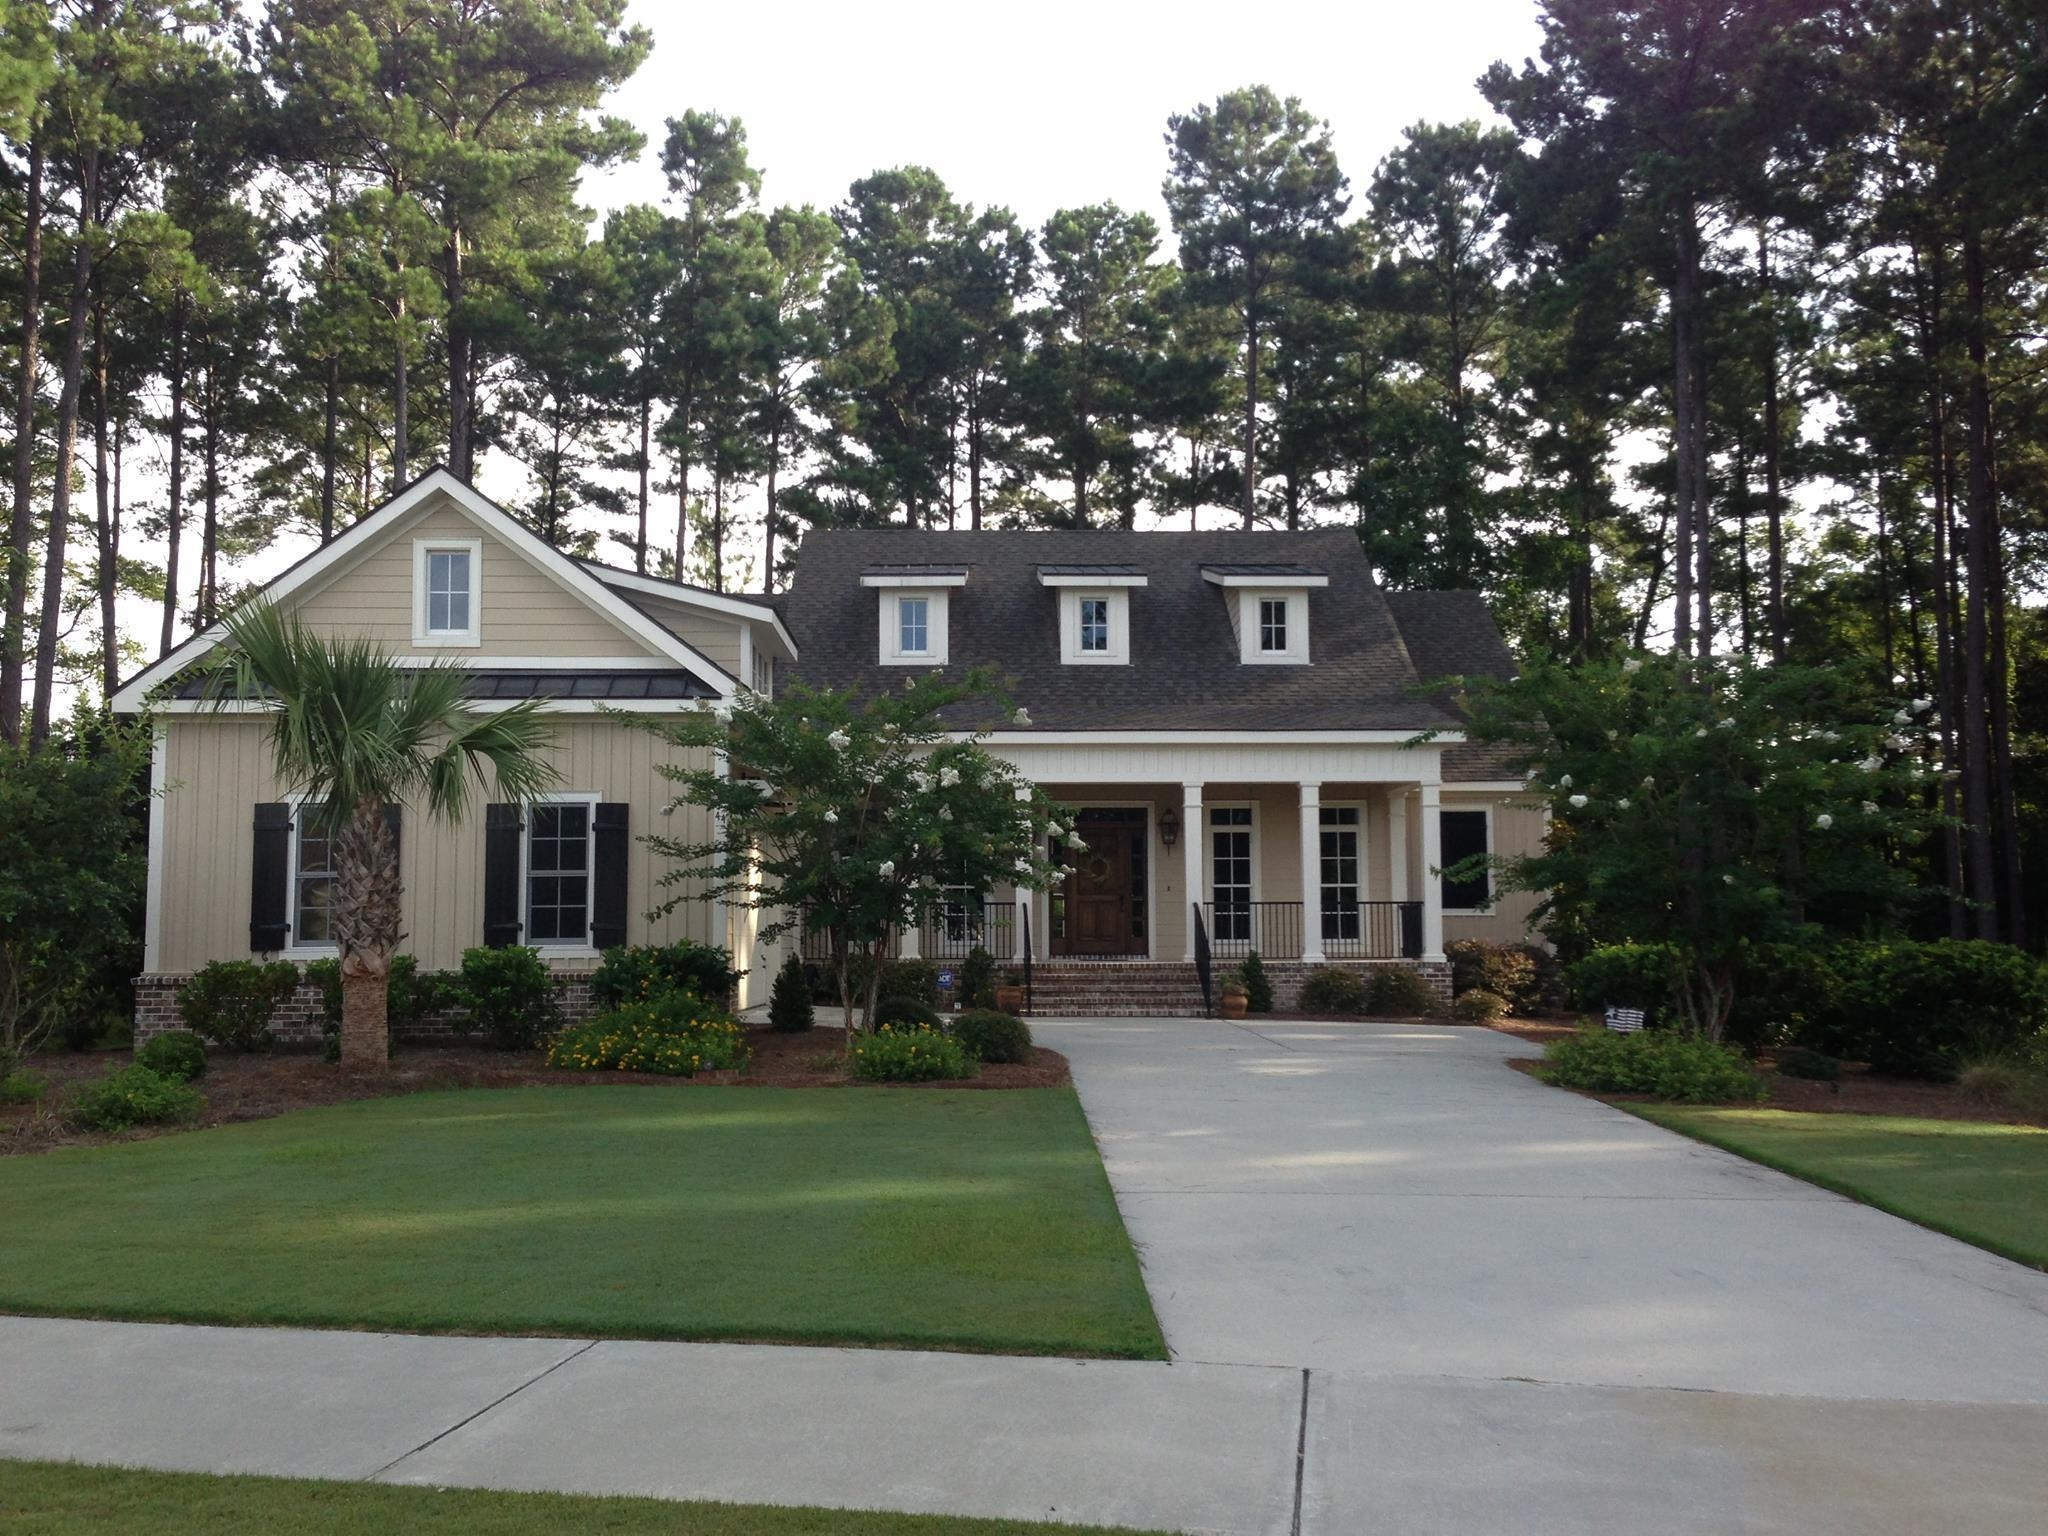 RoofCrafters-Savannah image 84